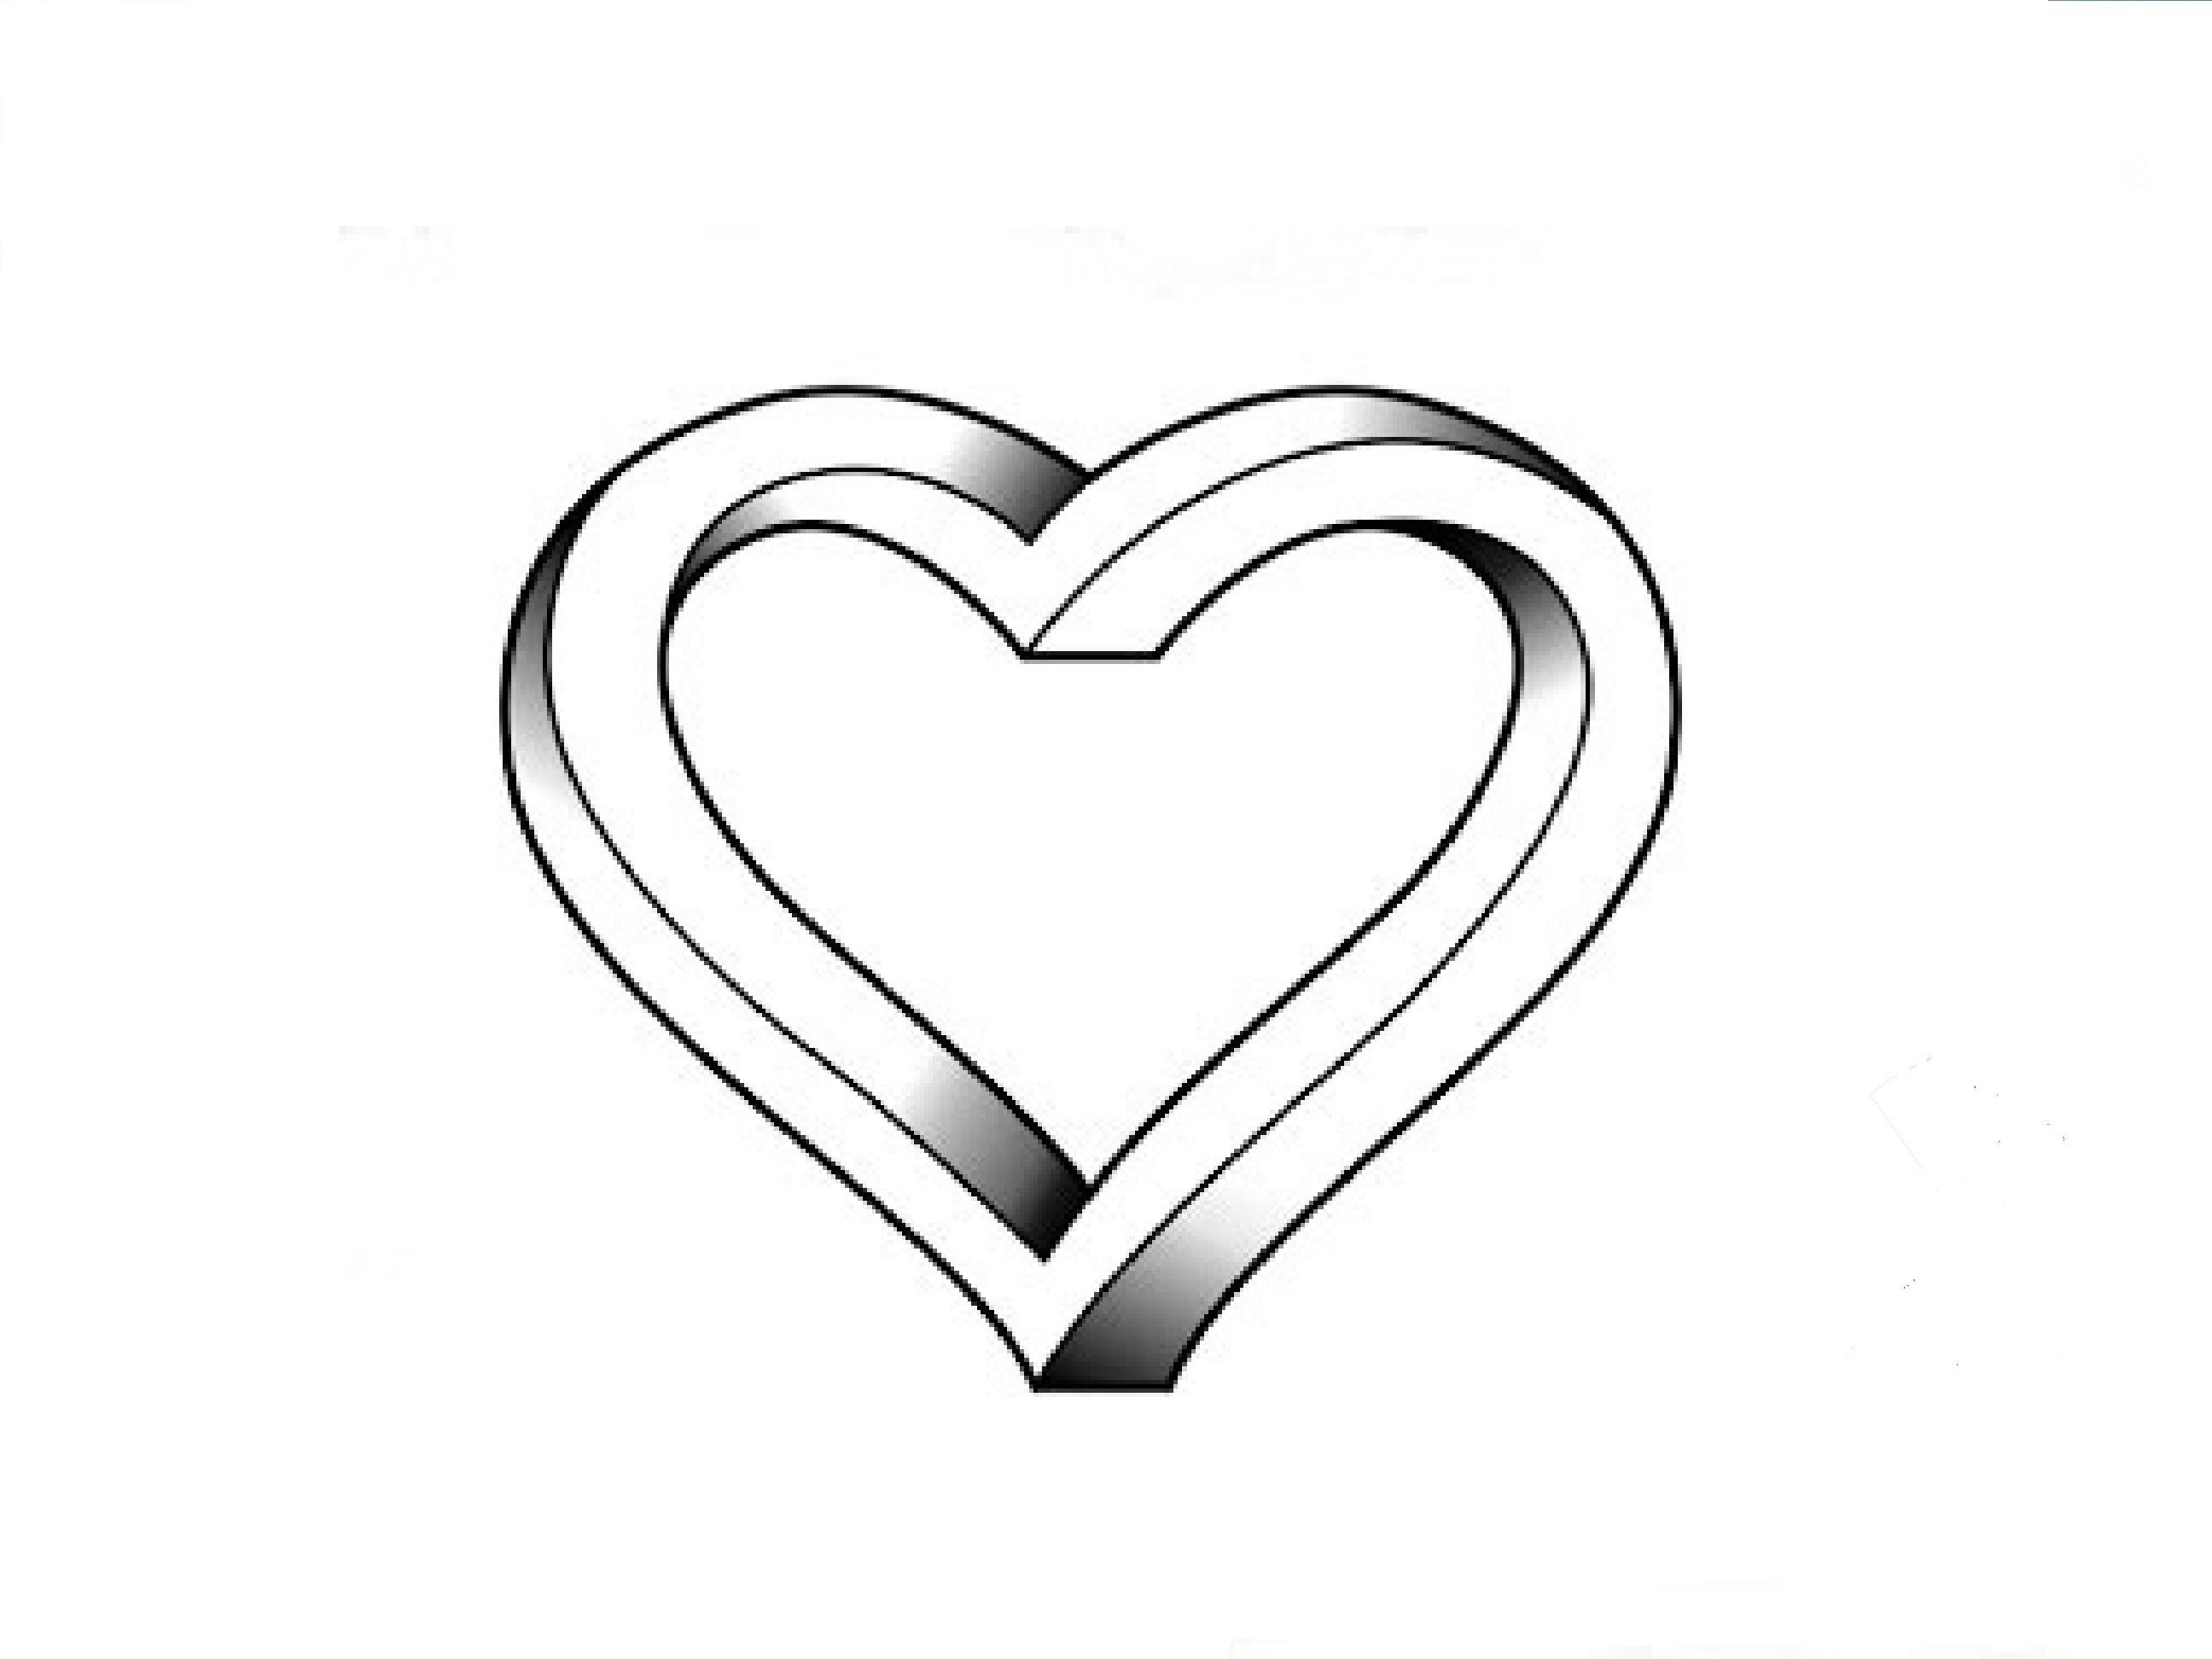 Drawn hearts simple Illusion / an Как Optical